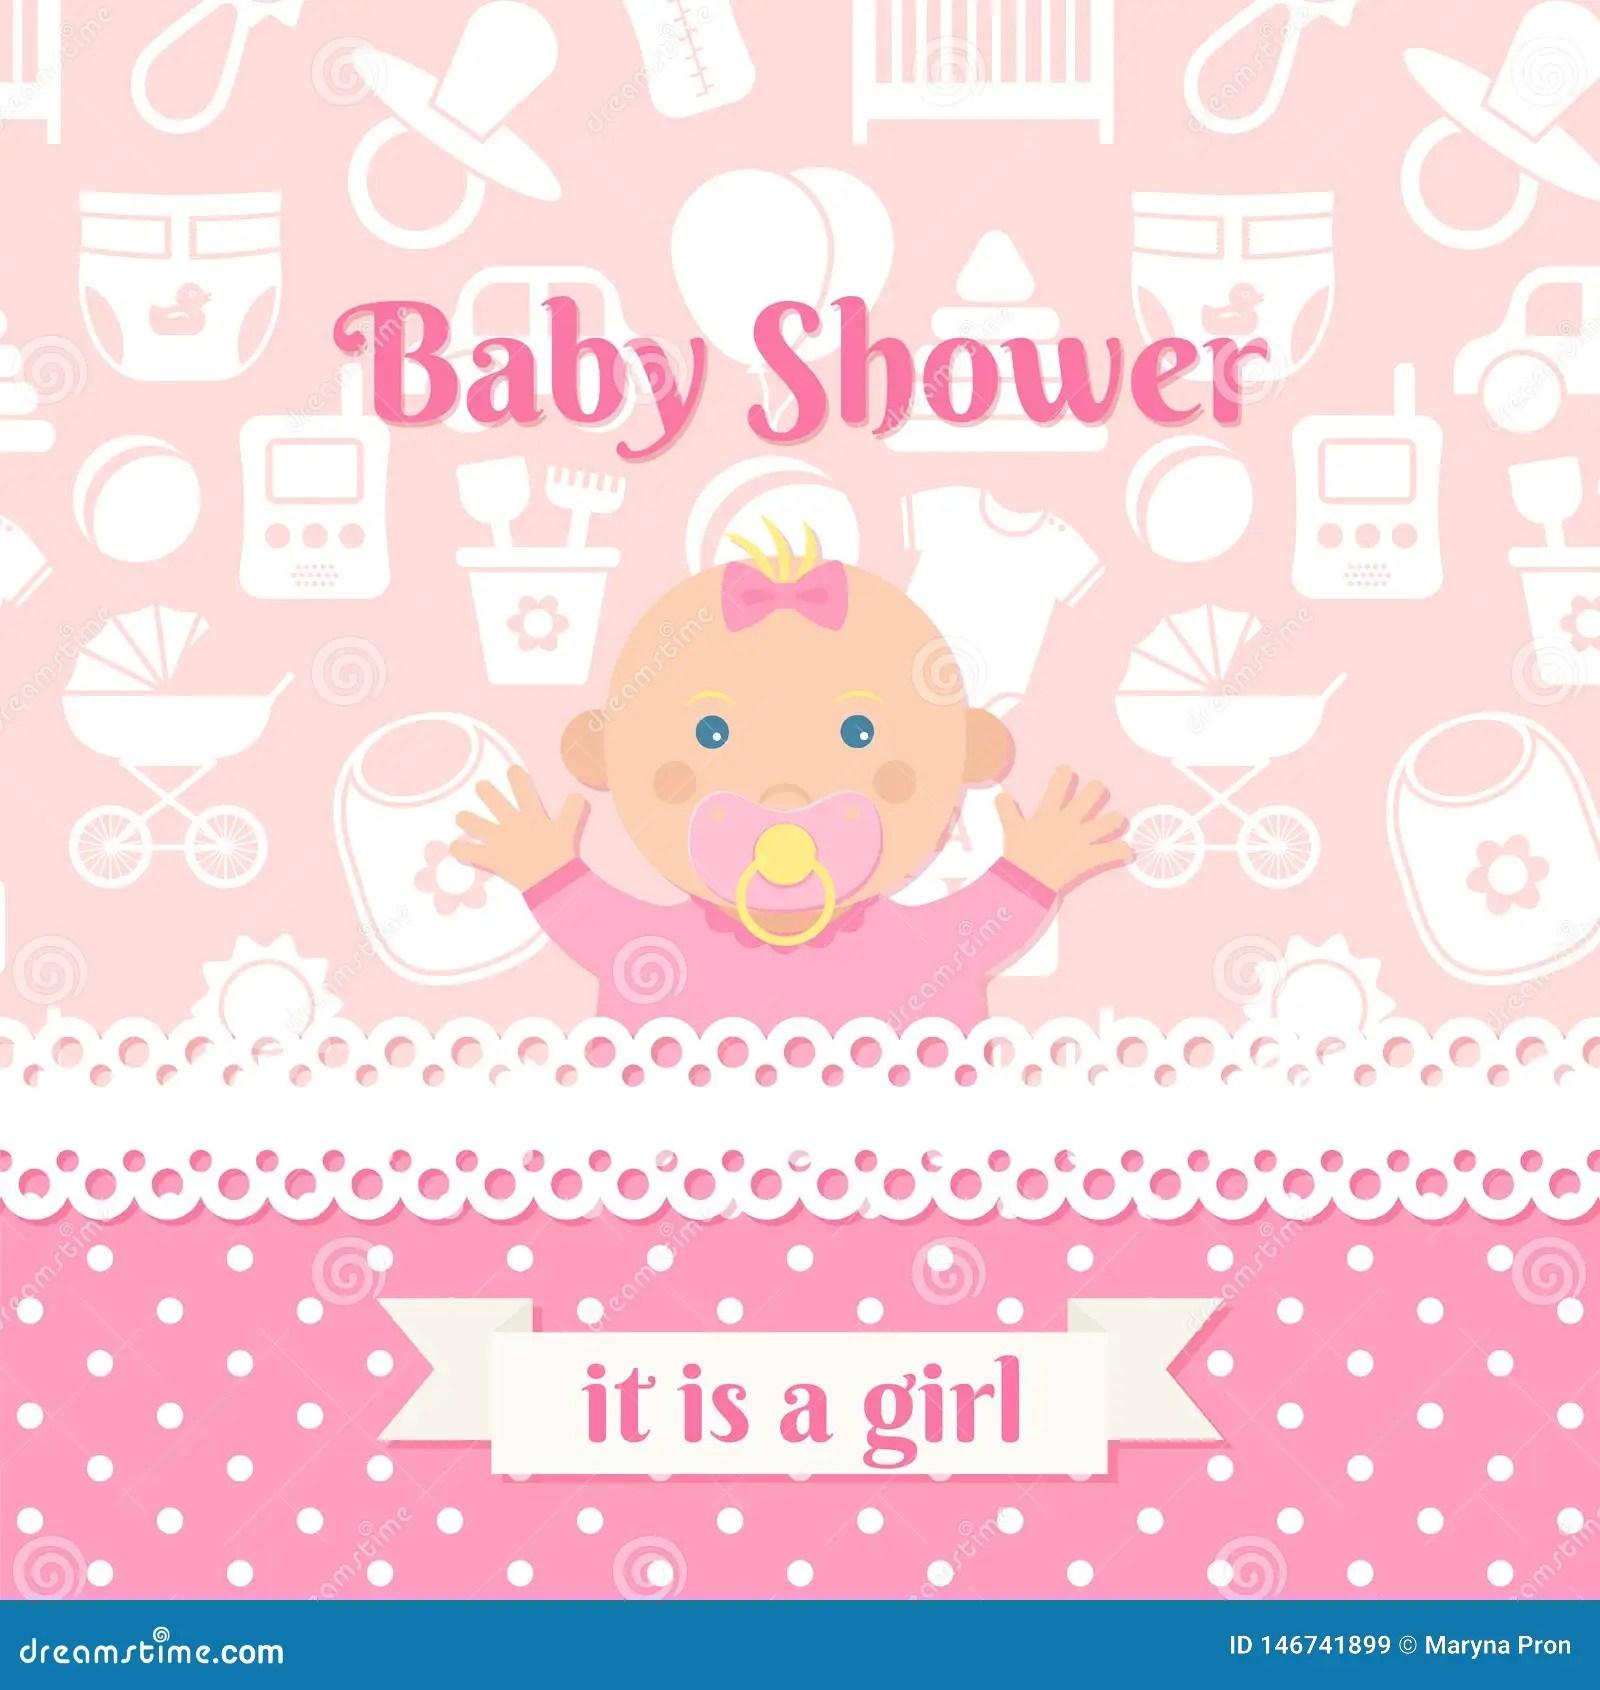 Baby birth background bird infant icons cartoon design. Baby Shower Card Design Vector Illustration Birthday Template Invite Stock Vector Illustration Of Border Frame 146741899